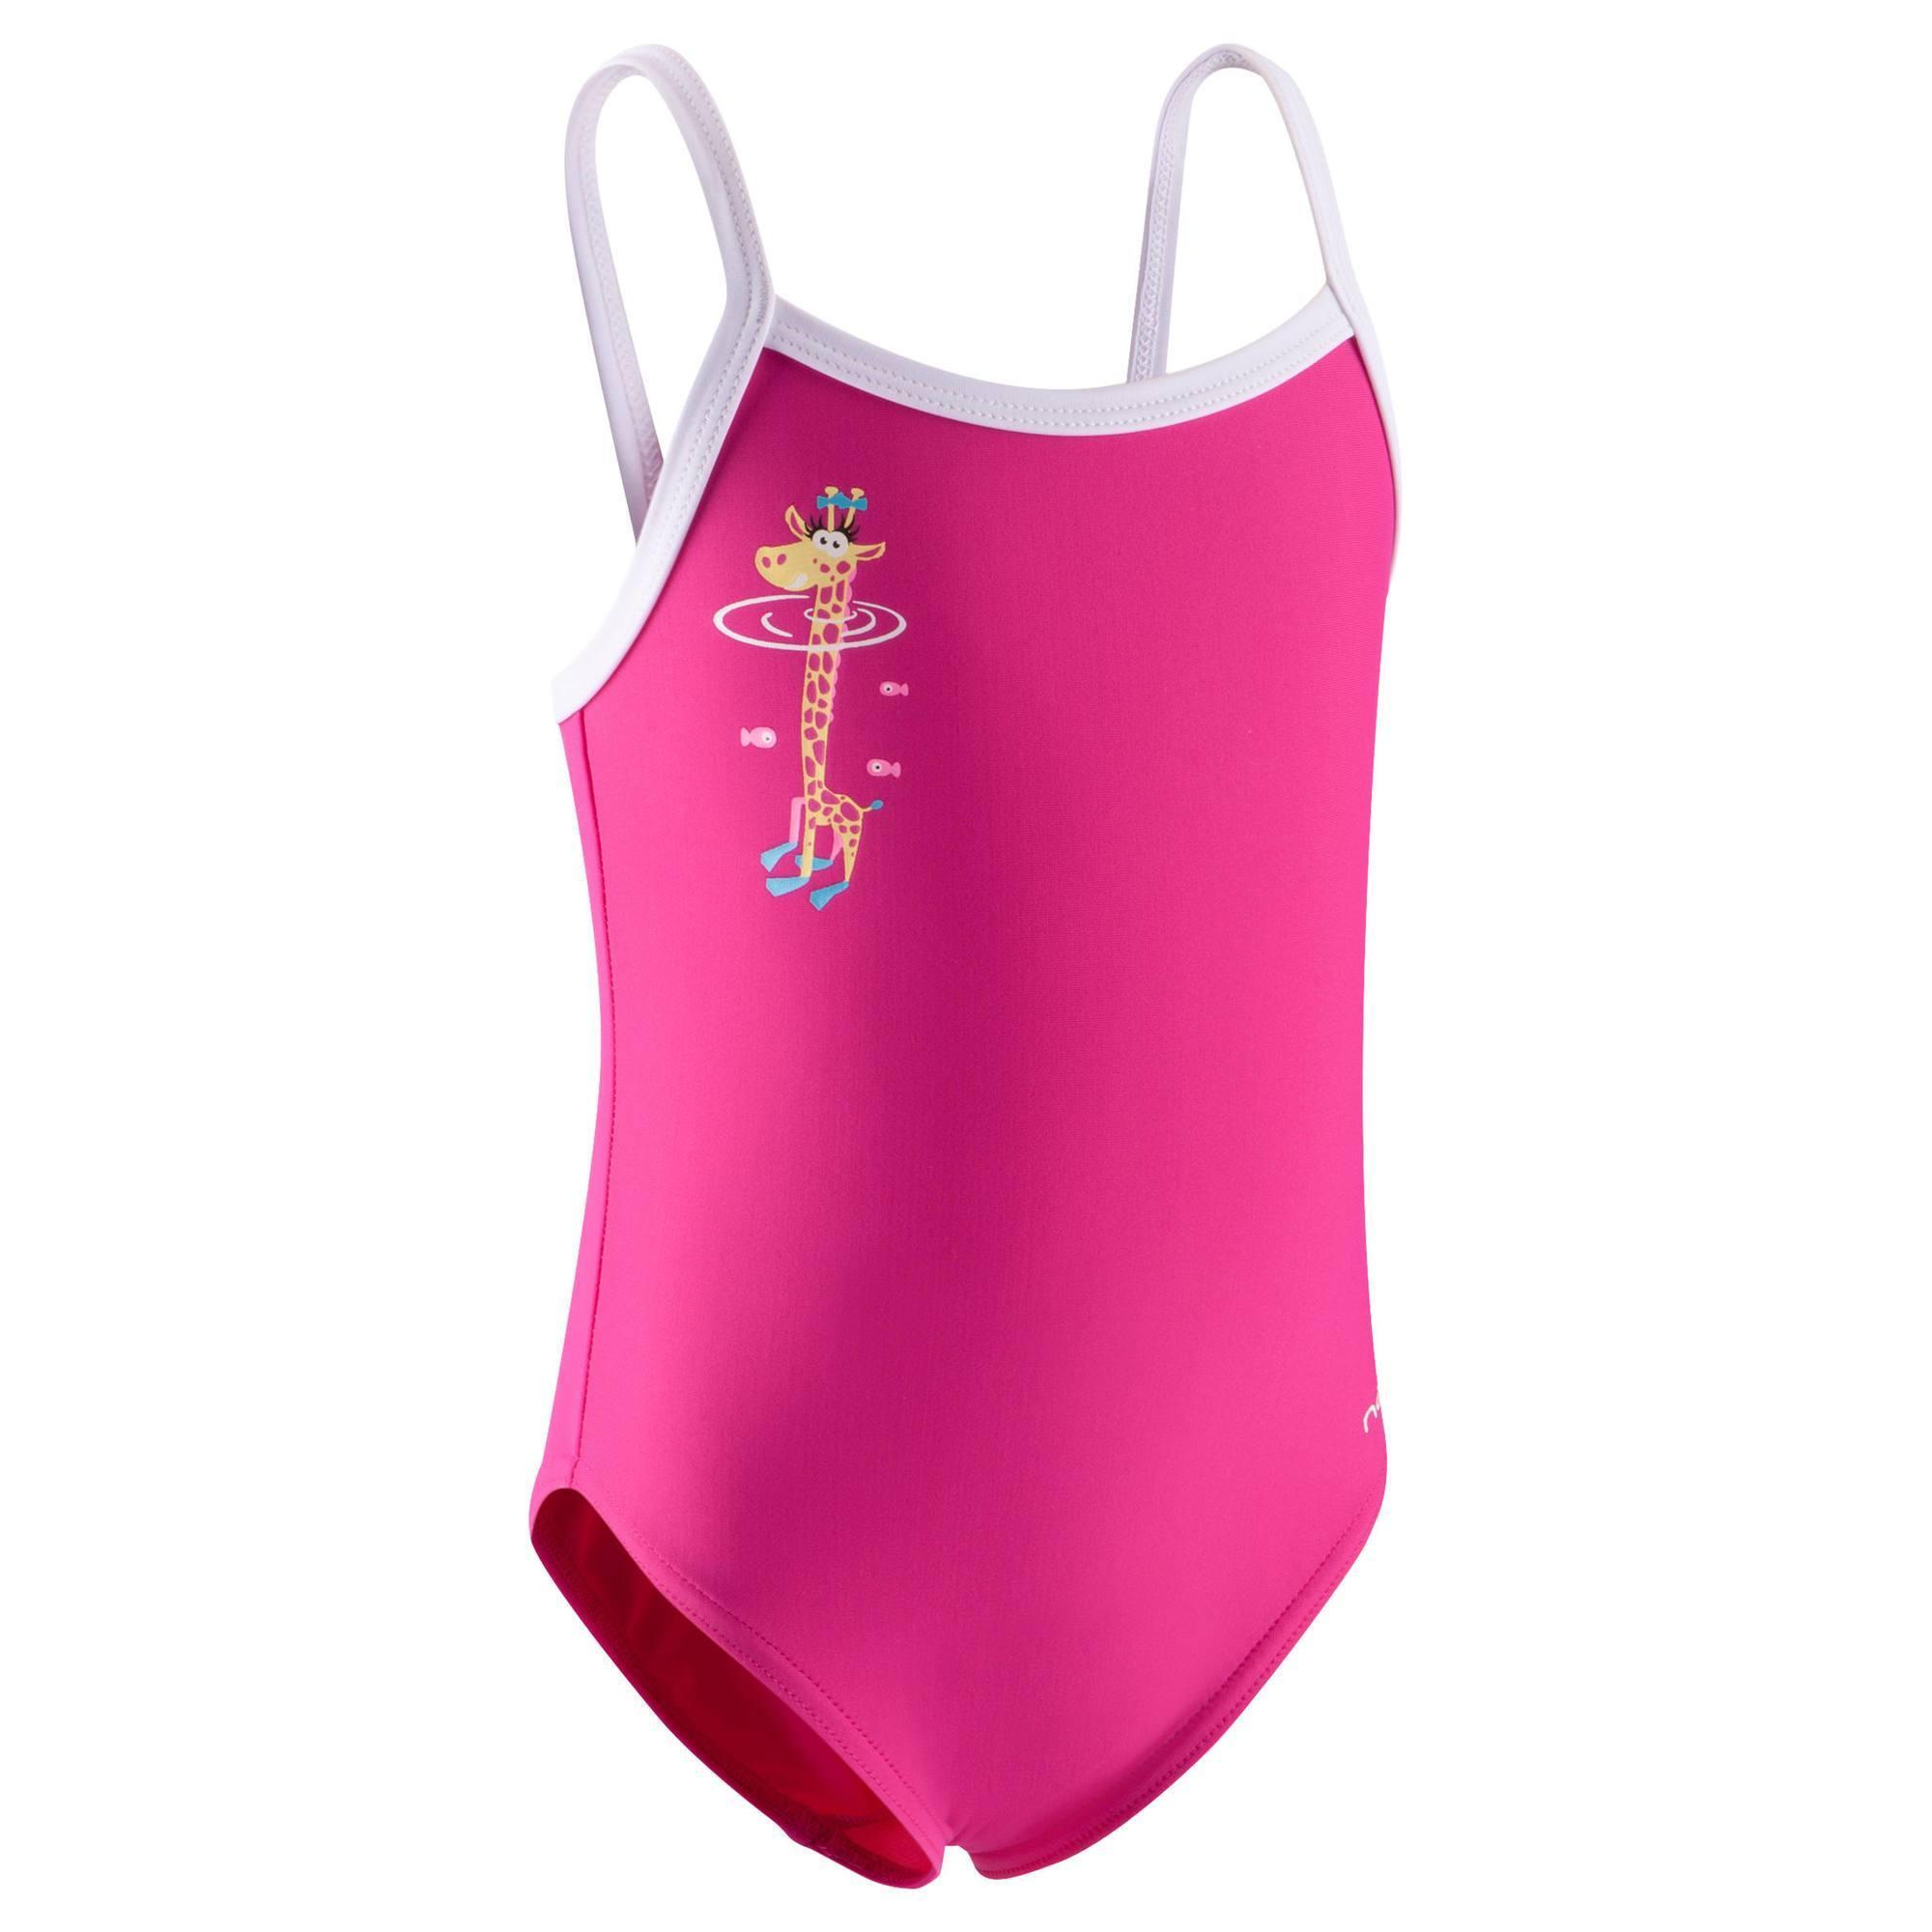 maillot de bain b b fille une pi ce madina rose gigi clubs collectivit s decathlon pro. Black Bedroom Furniture Sets. Home Design Ideas